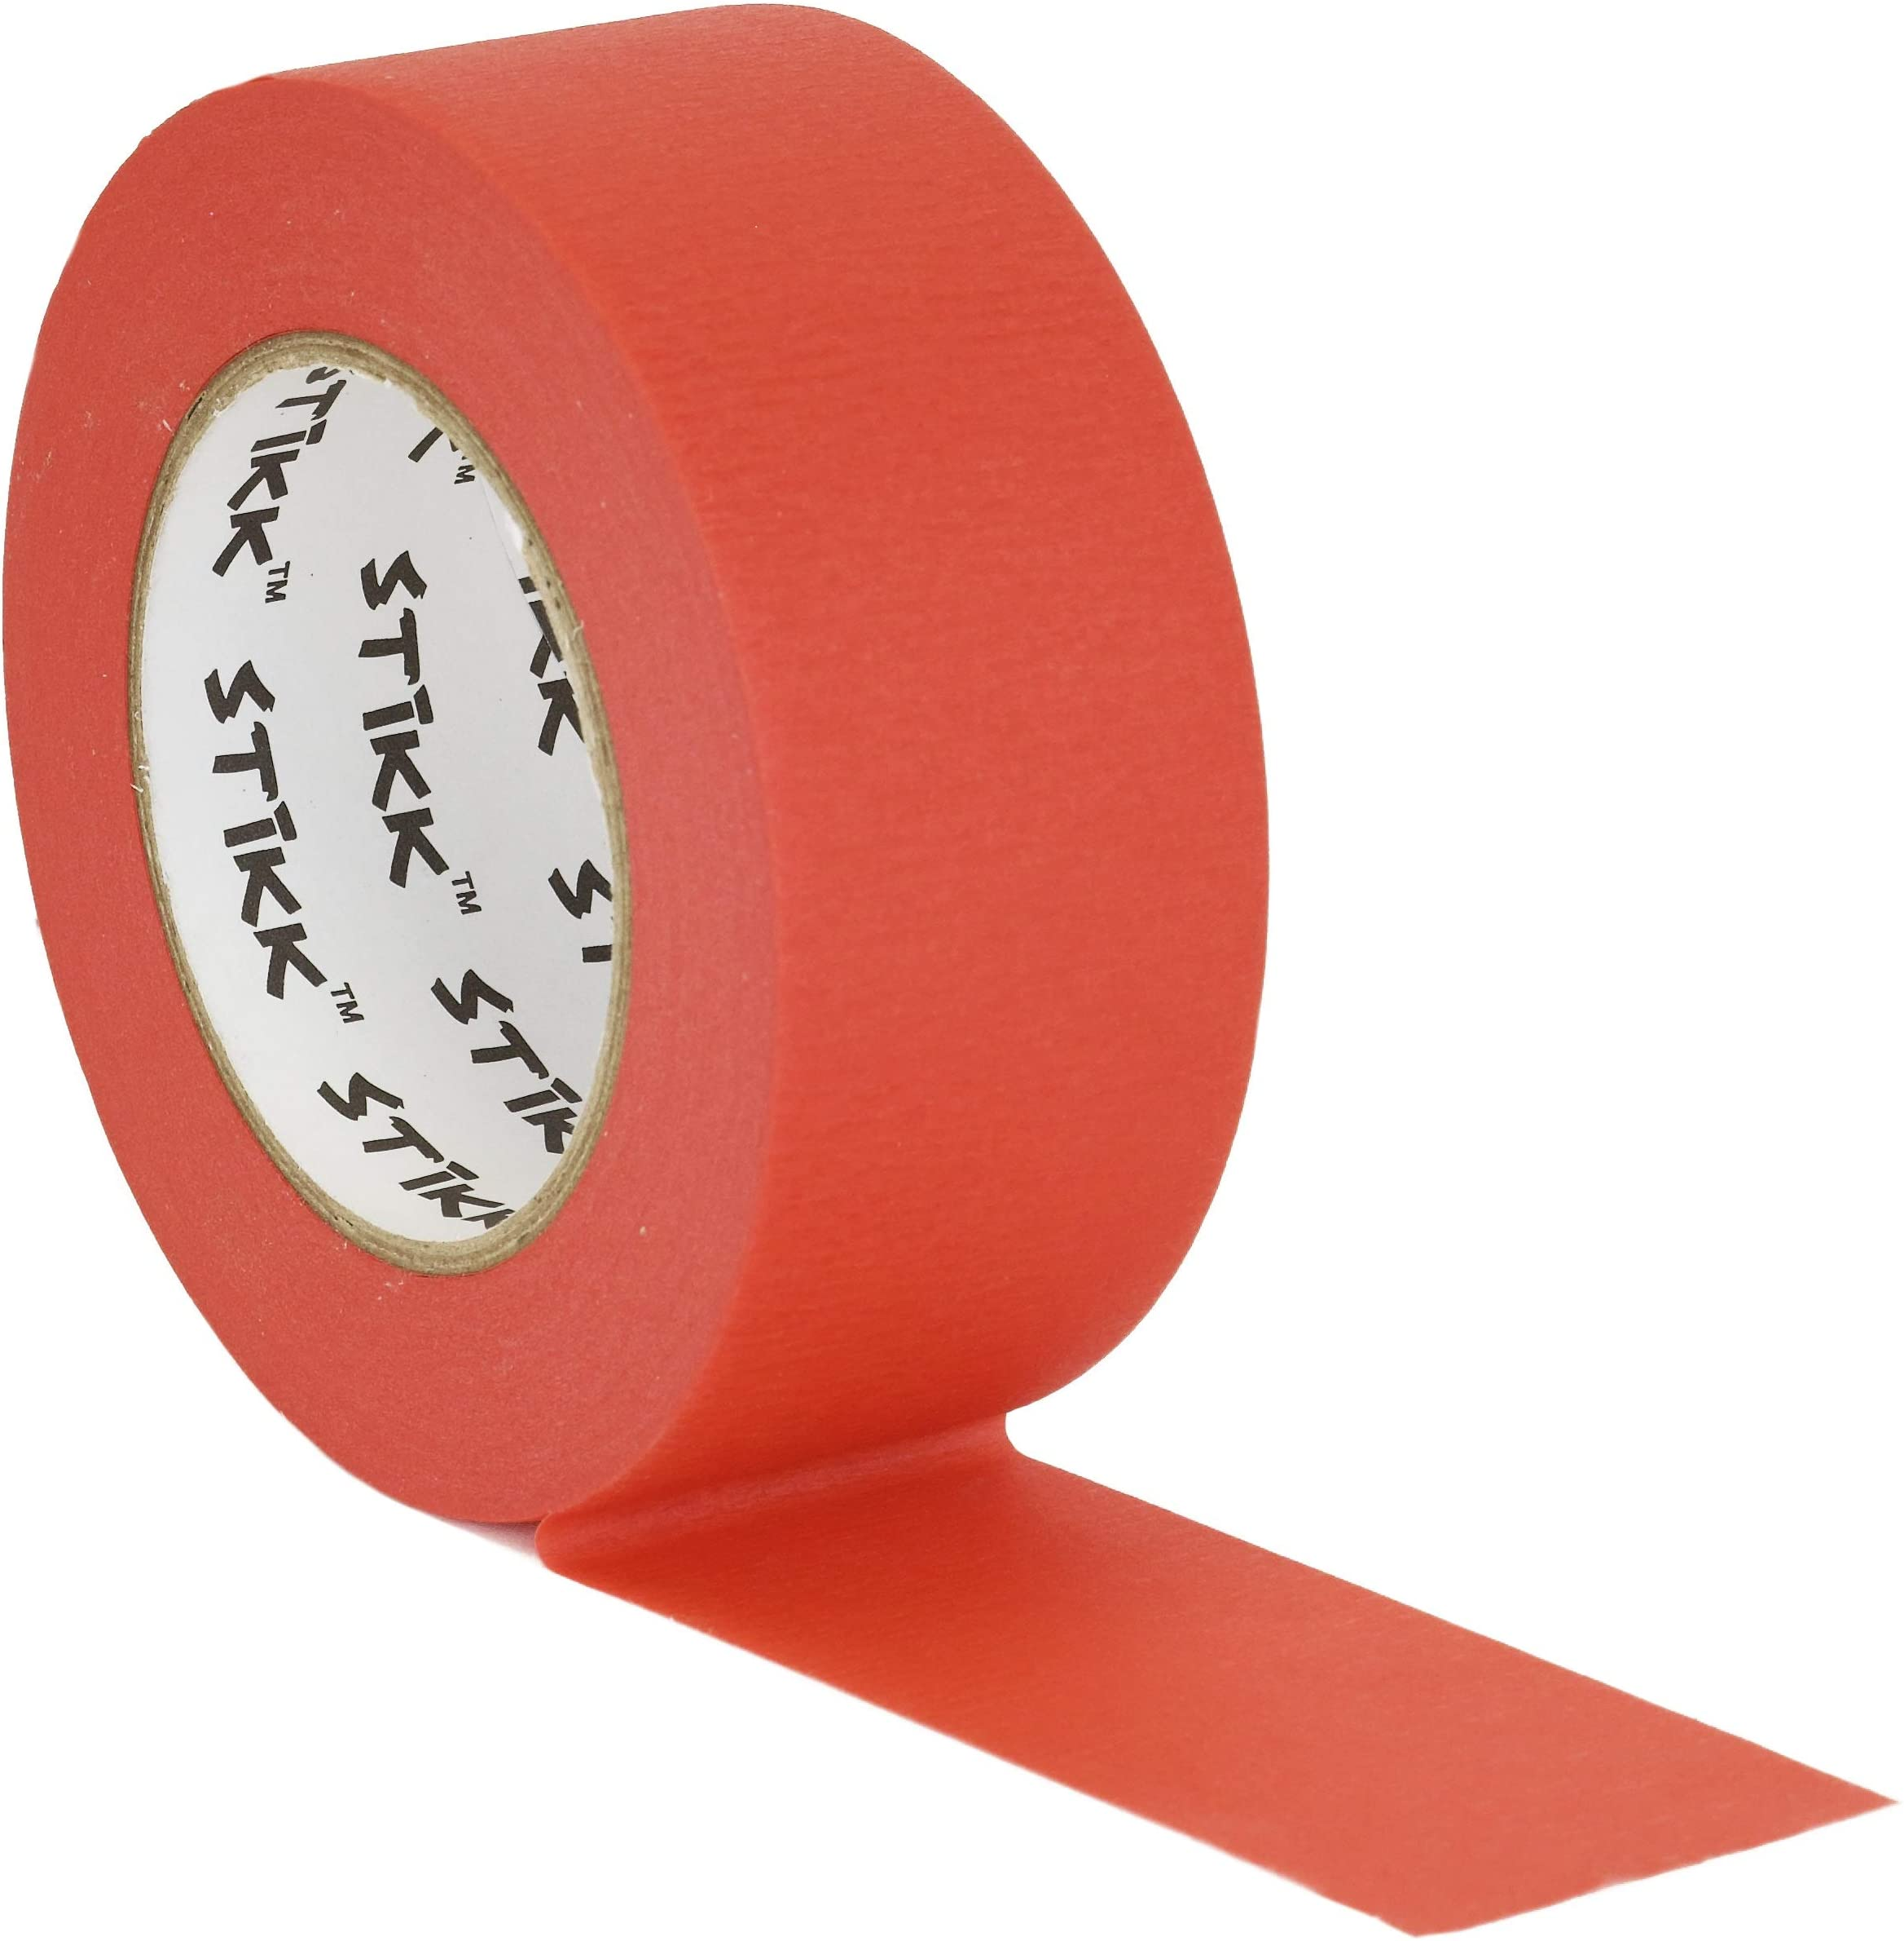 3 x masking tapes in set red, border, stripe